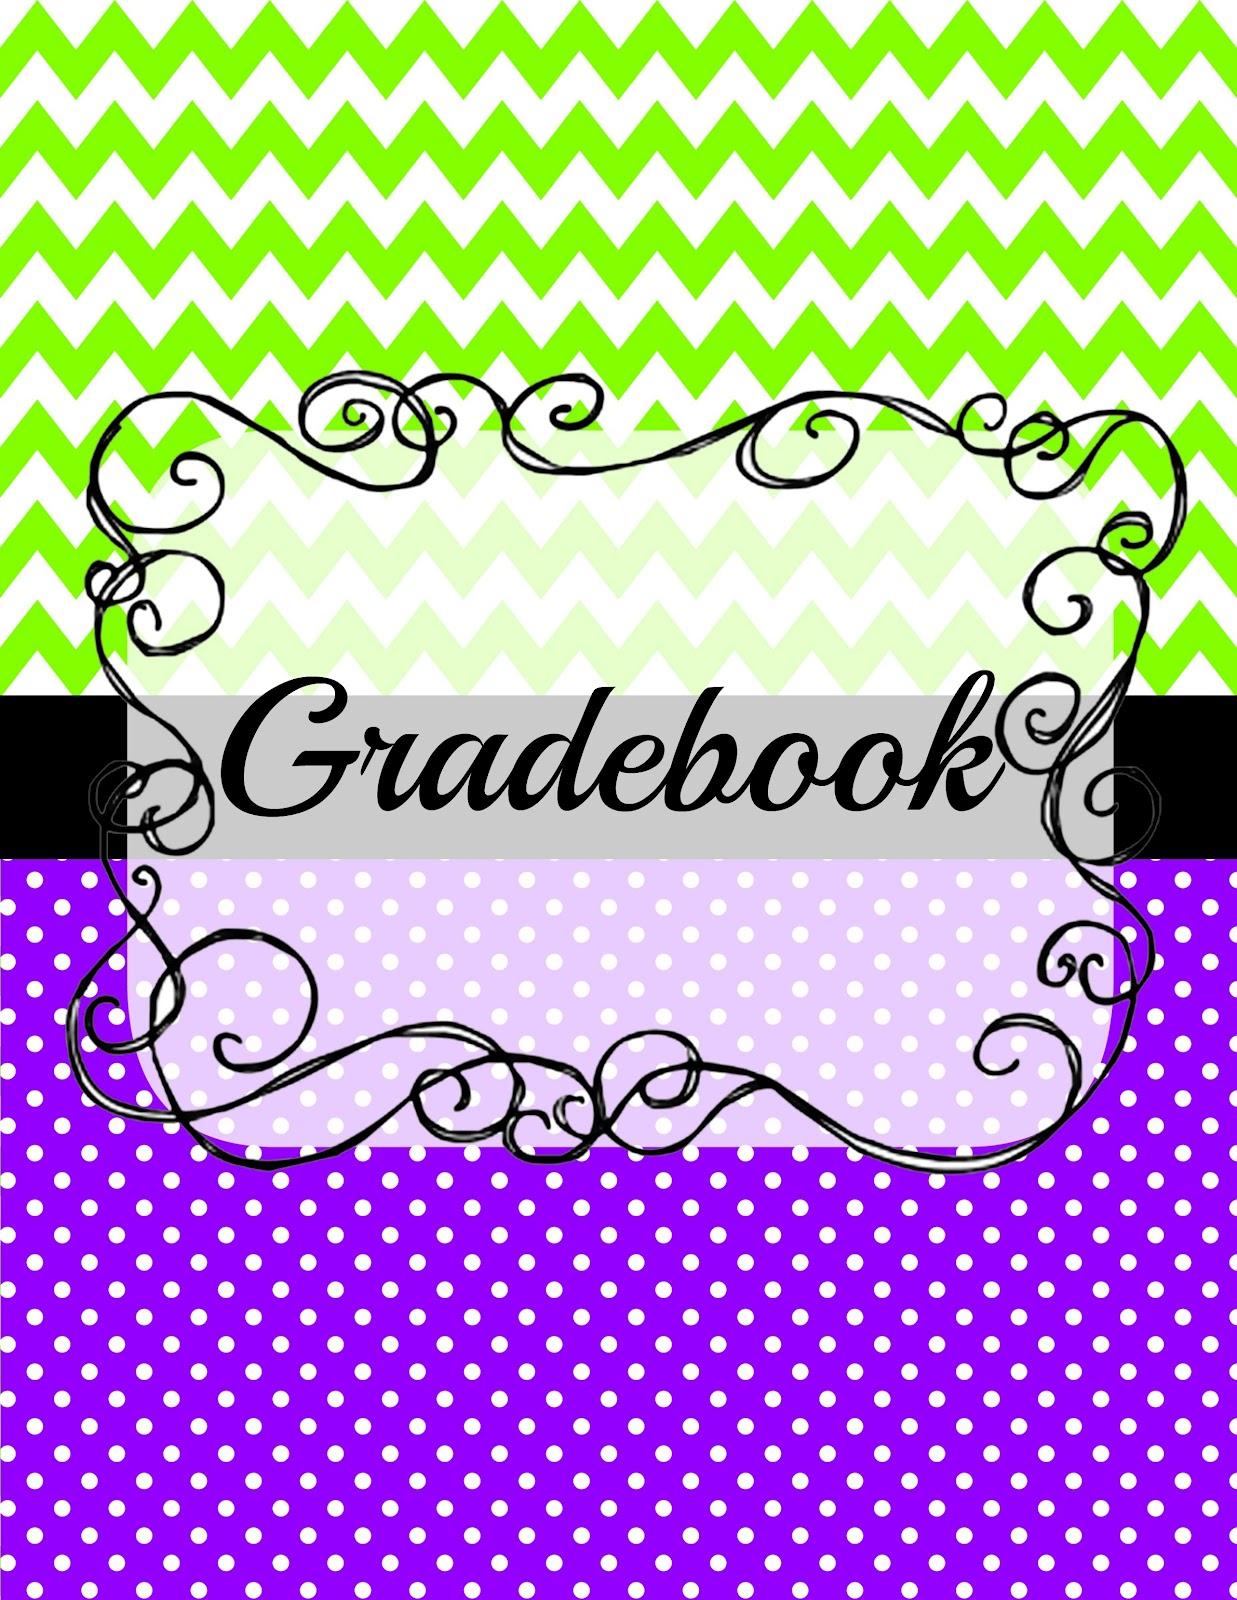 grade book 2008-9-29 grade 5 spelling practice book 1vcmjtife cz bdnjmmbo d(sbx )jmm pg d(sbx )jmm &evdbujpo b ejwjtjpo pg 5if d(sbx )jmm $pnqbojft od 5xp 1foo 1mb[b /fx :psl.